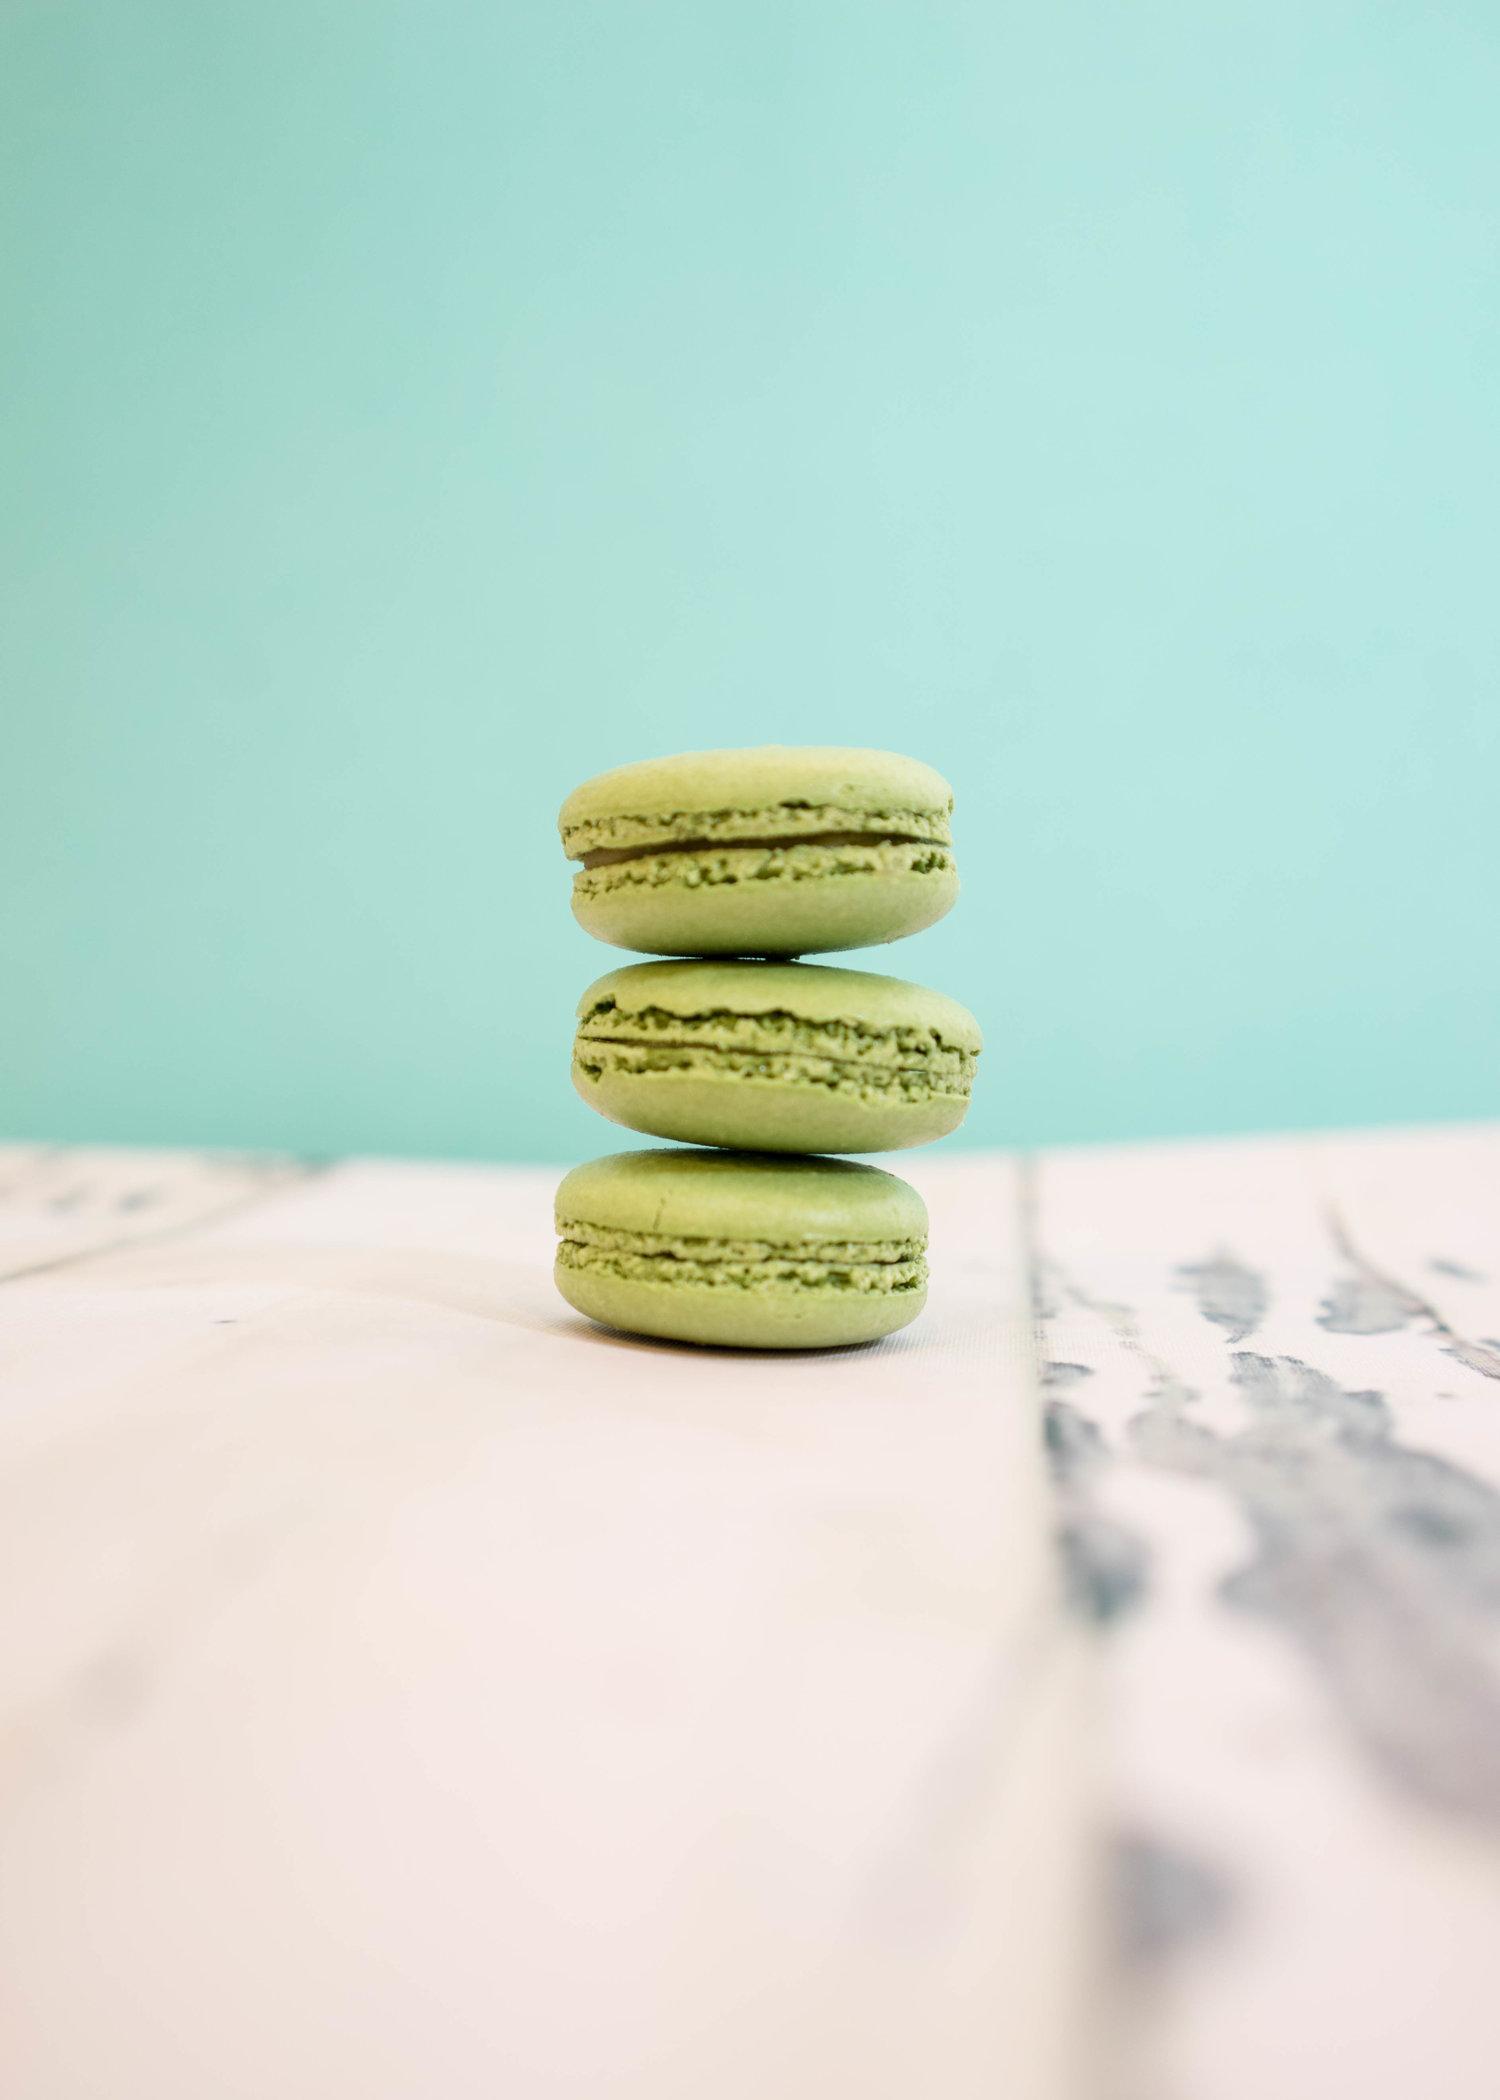 pistachio-macaron-photography-by-food-photographer-palo-alto